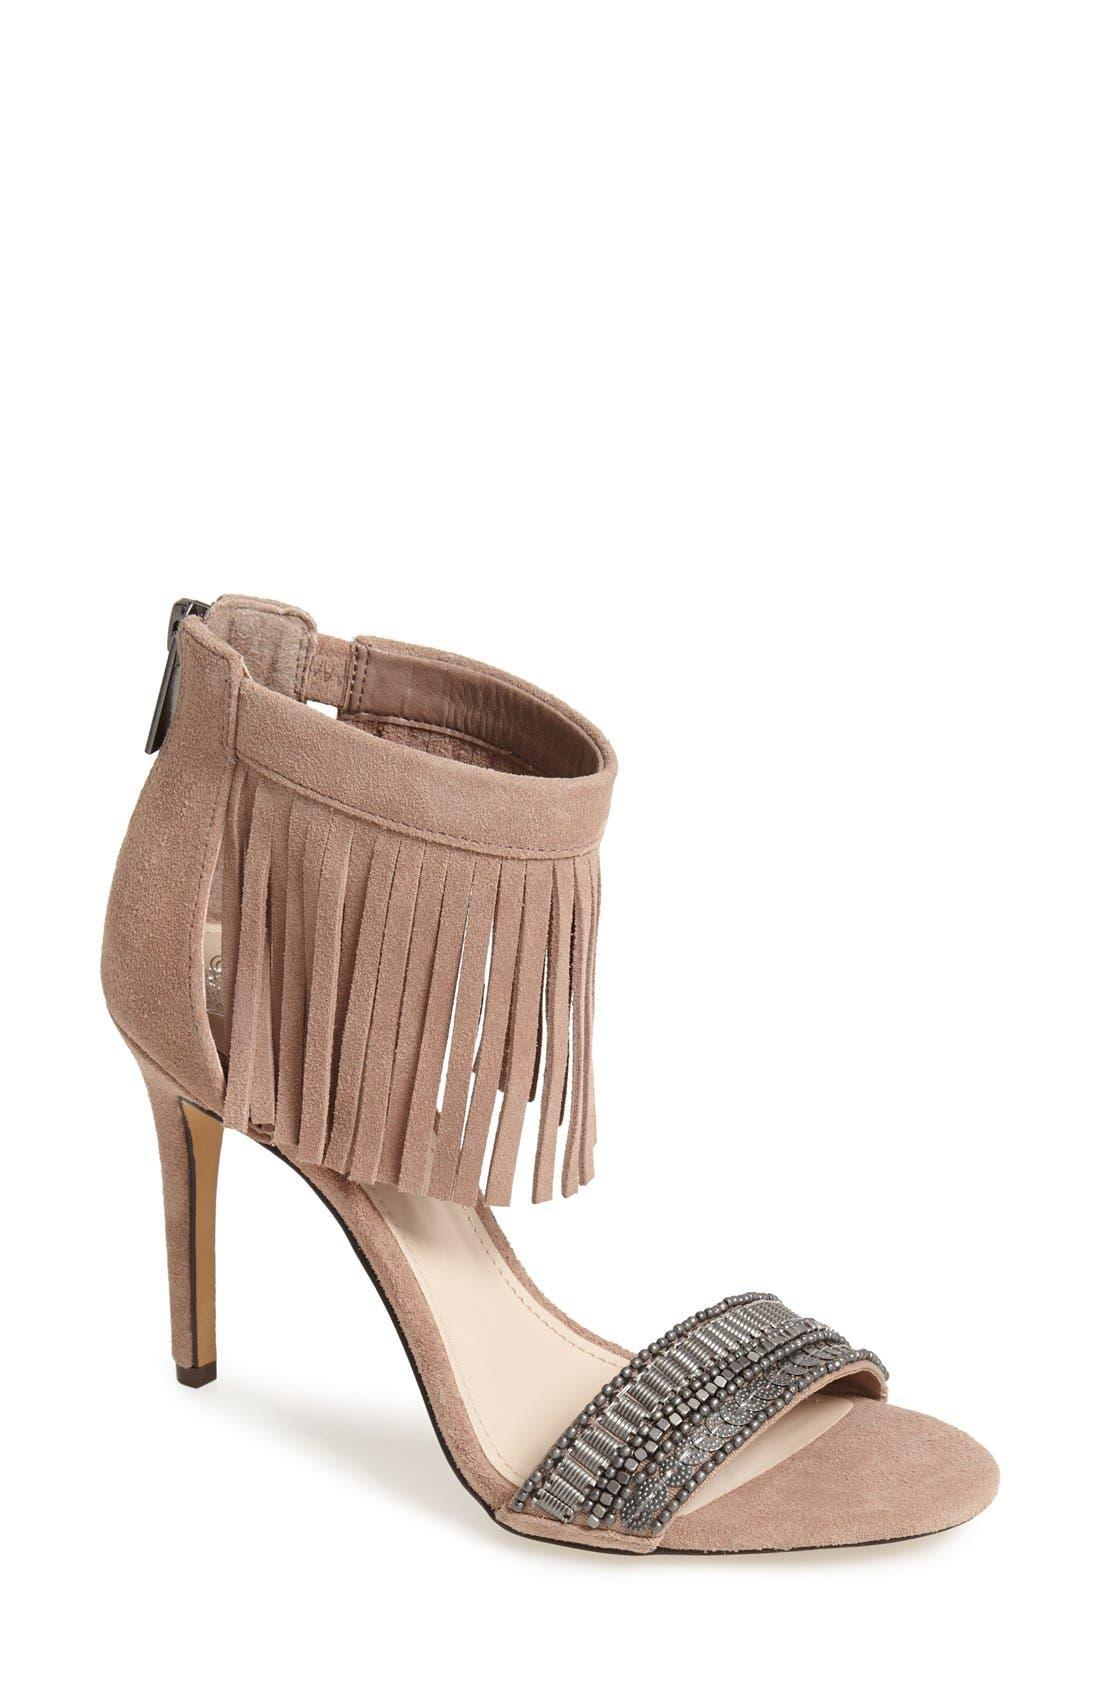 Alternate Image 1 Selected - Vince Camuto 'Trumen' Fringe Sandal (Women)